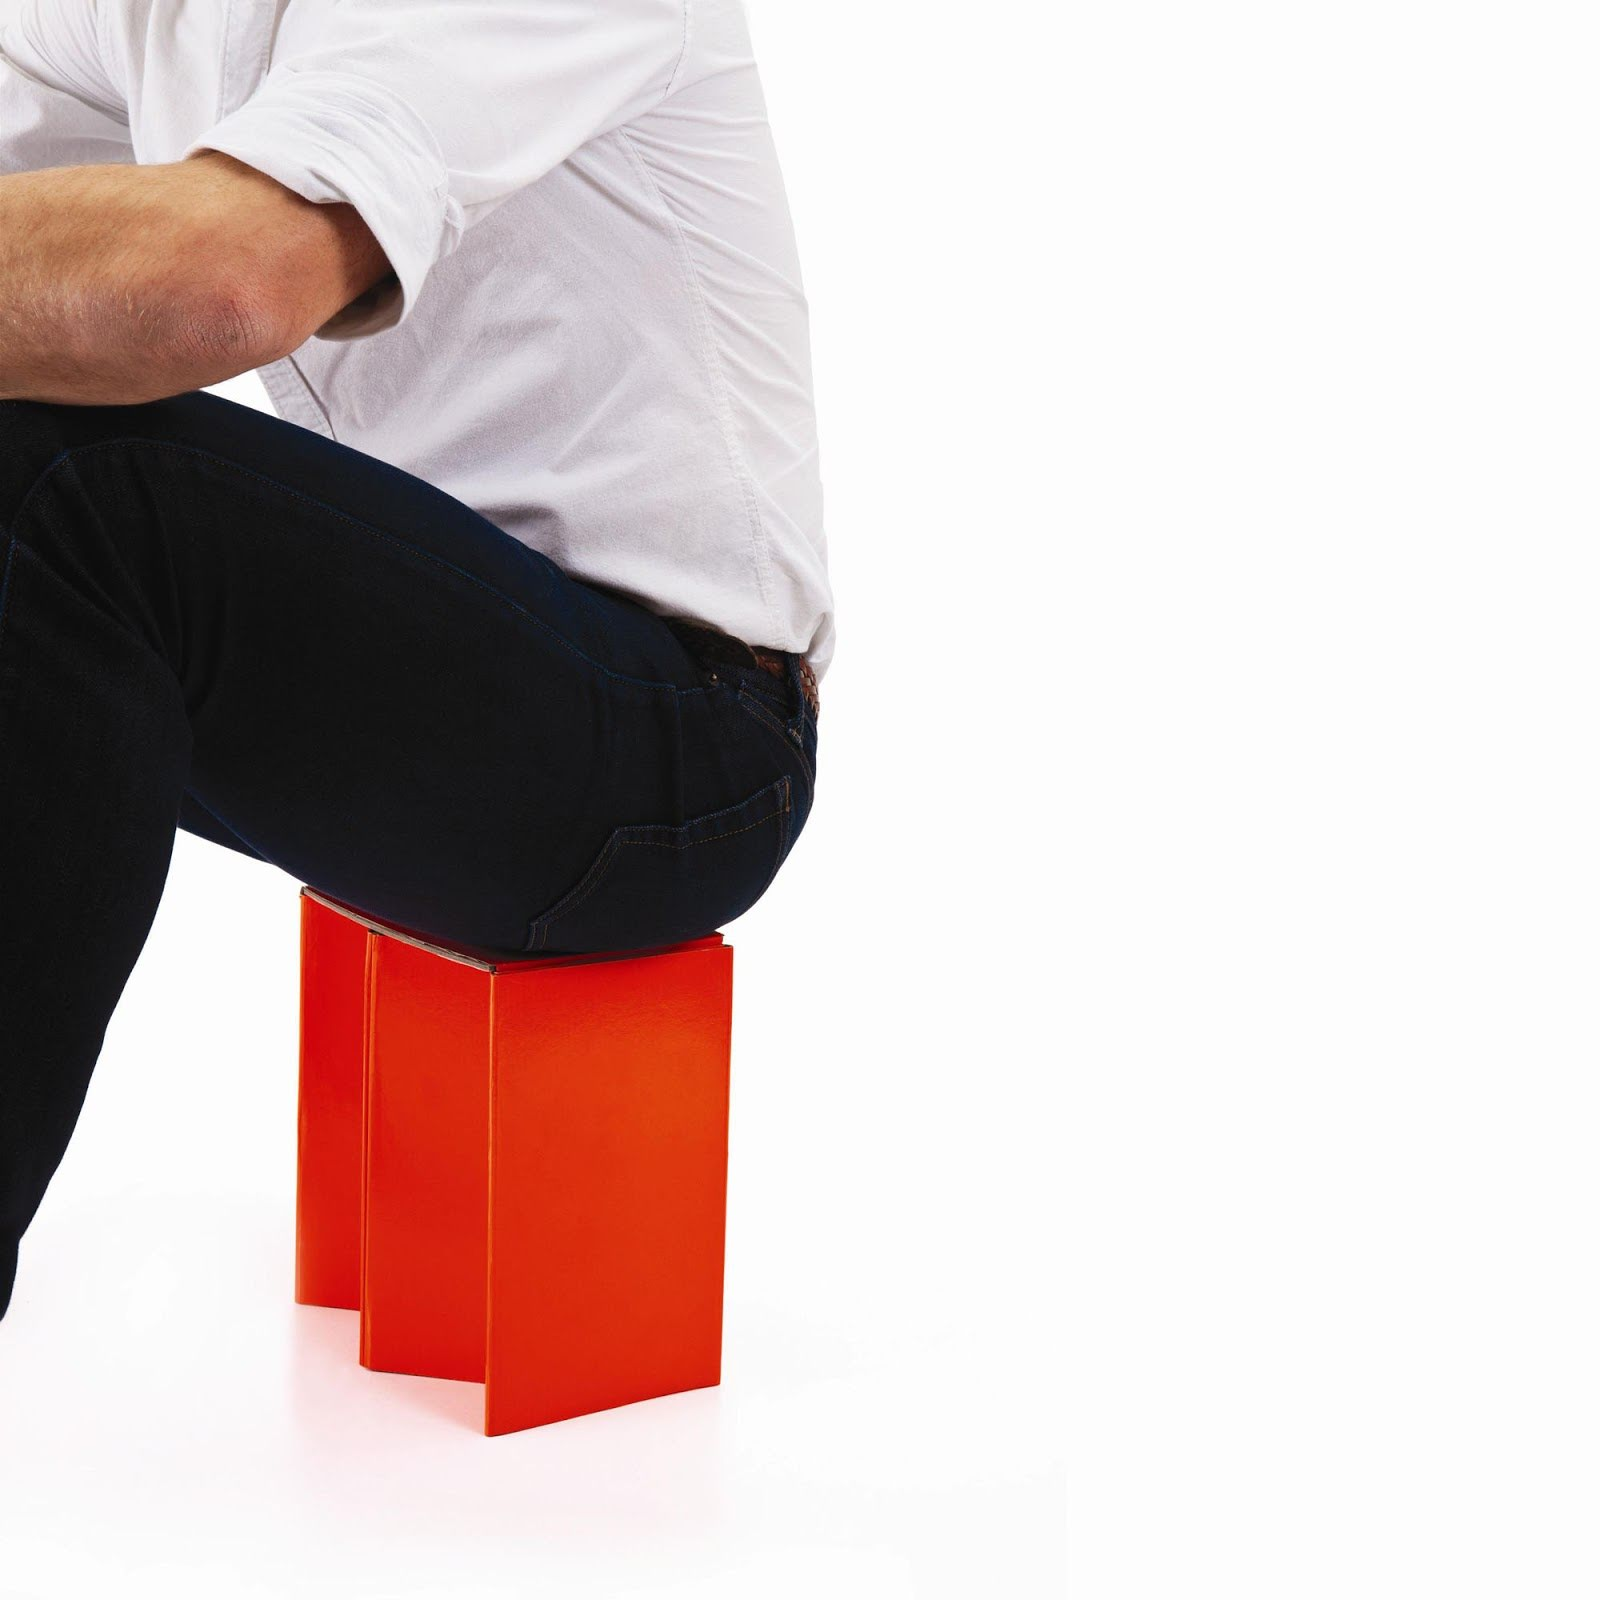 Folding Cardboard Chair